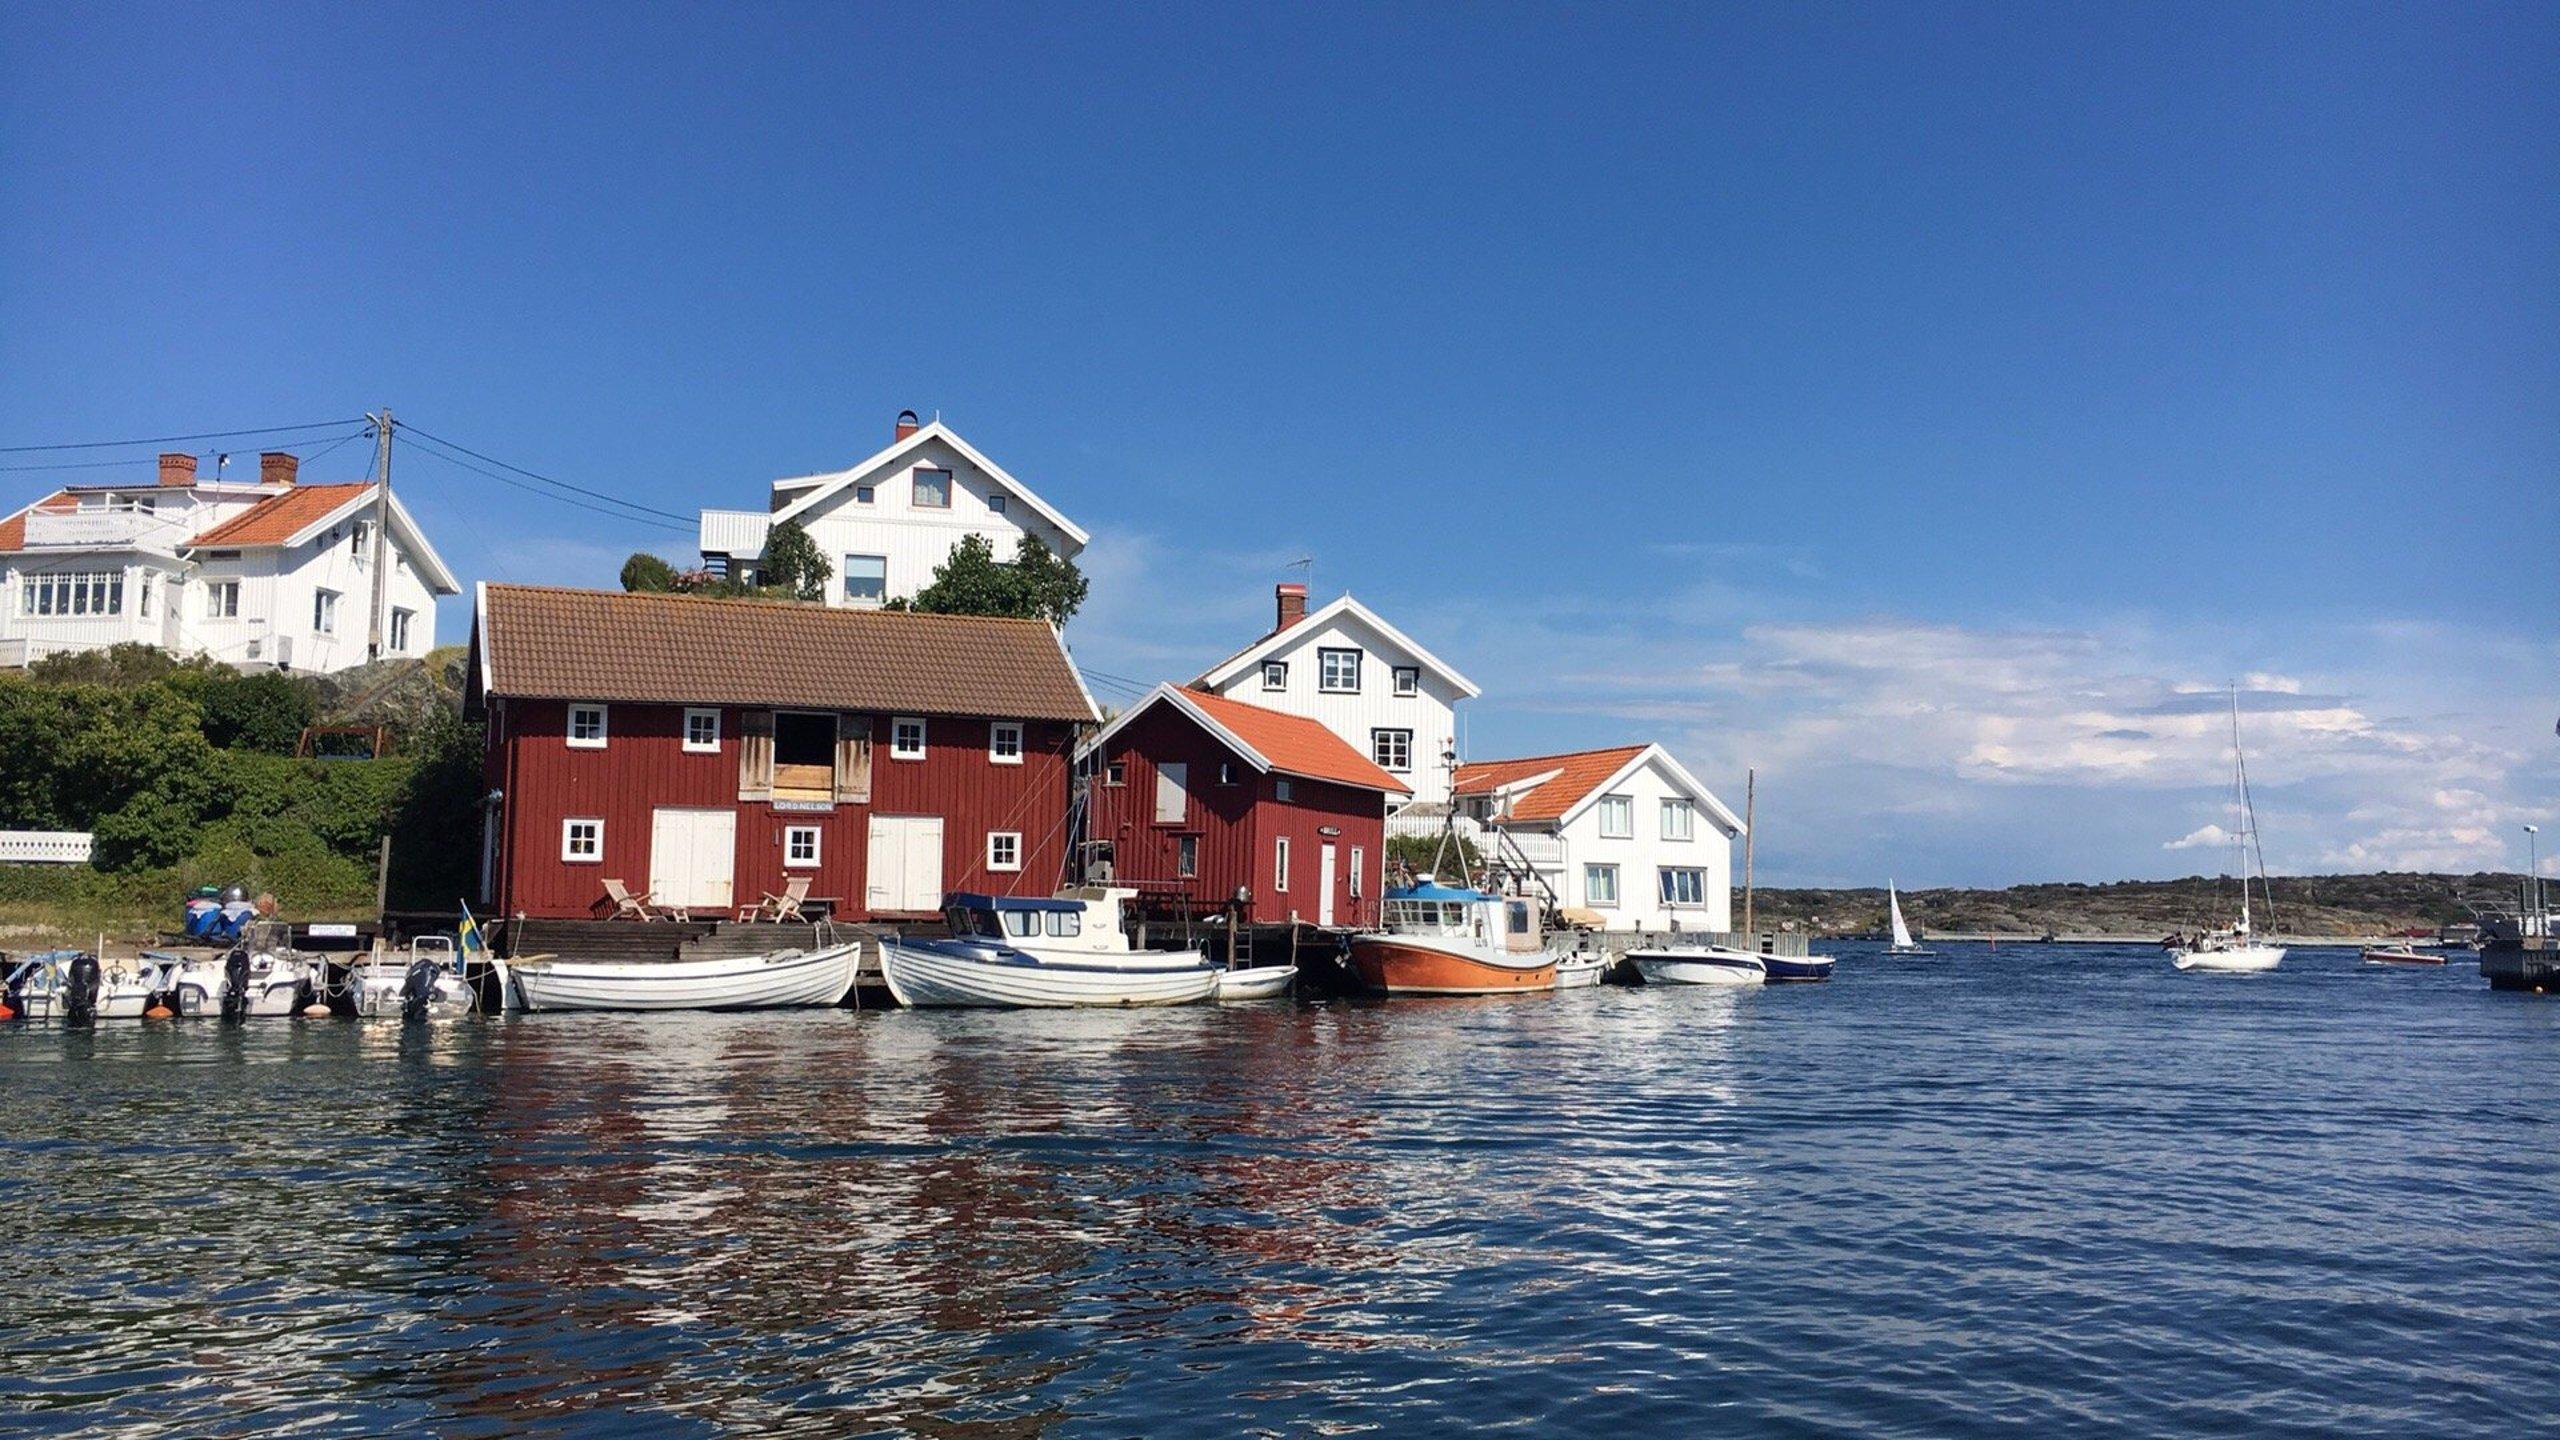 Besok Gullholmen I 2020 Det Beste Innen Gullholmen Sverige